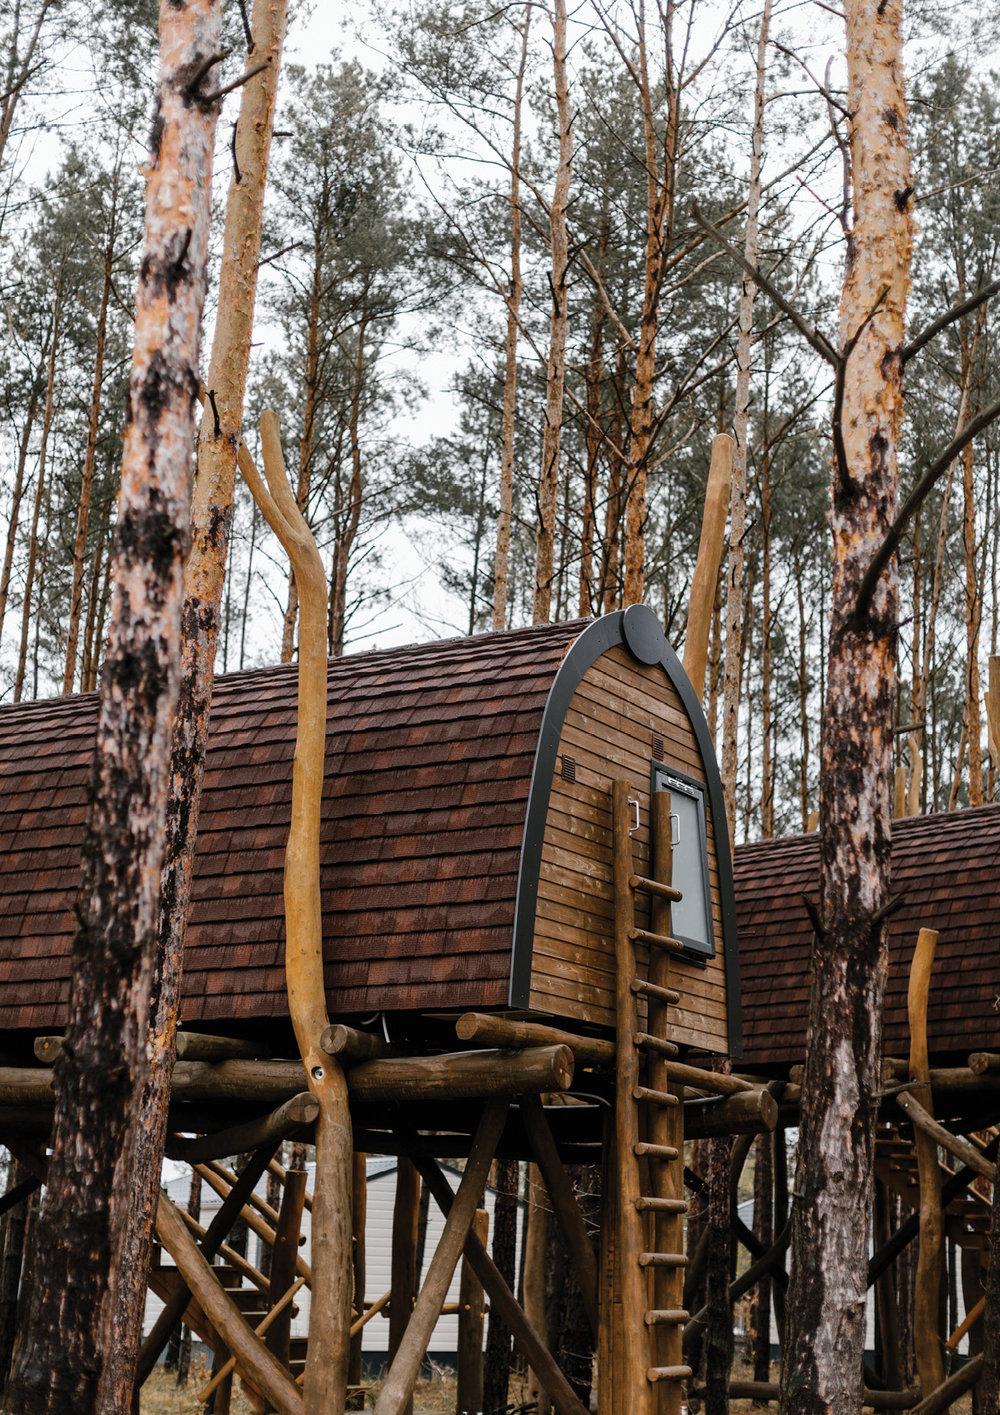 Tree houses at Lake Senftenberg